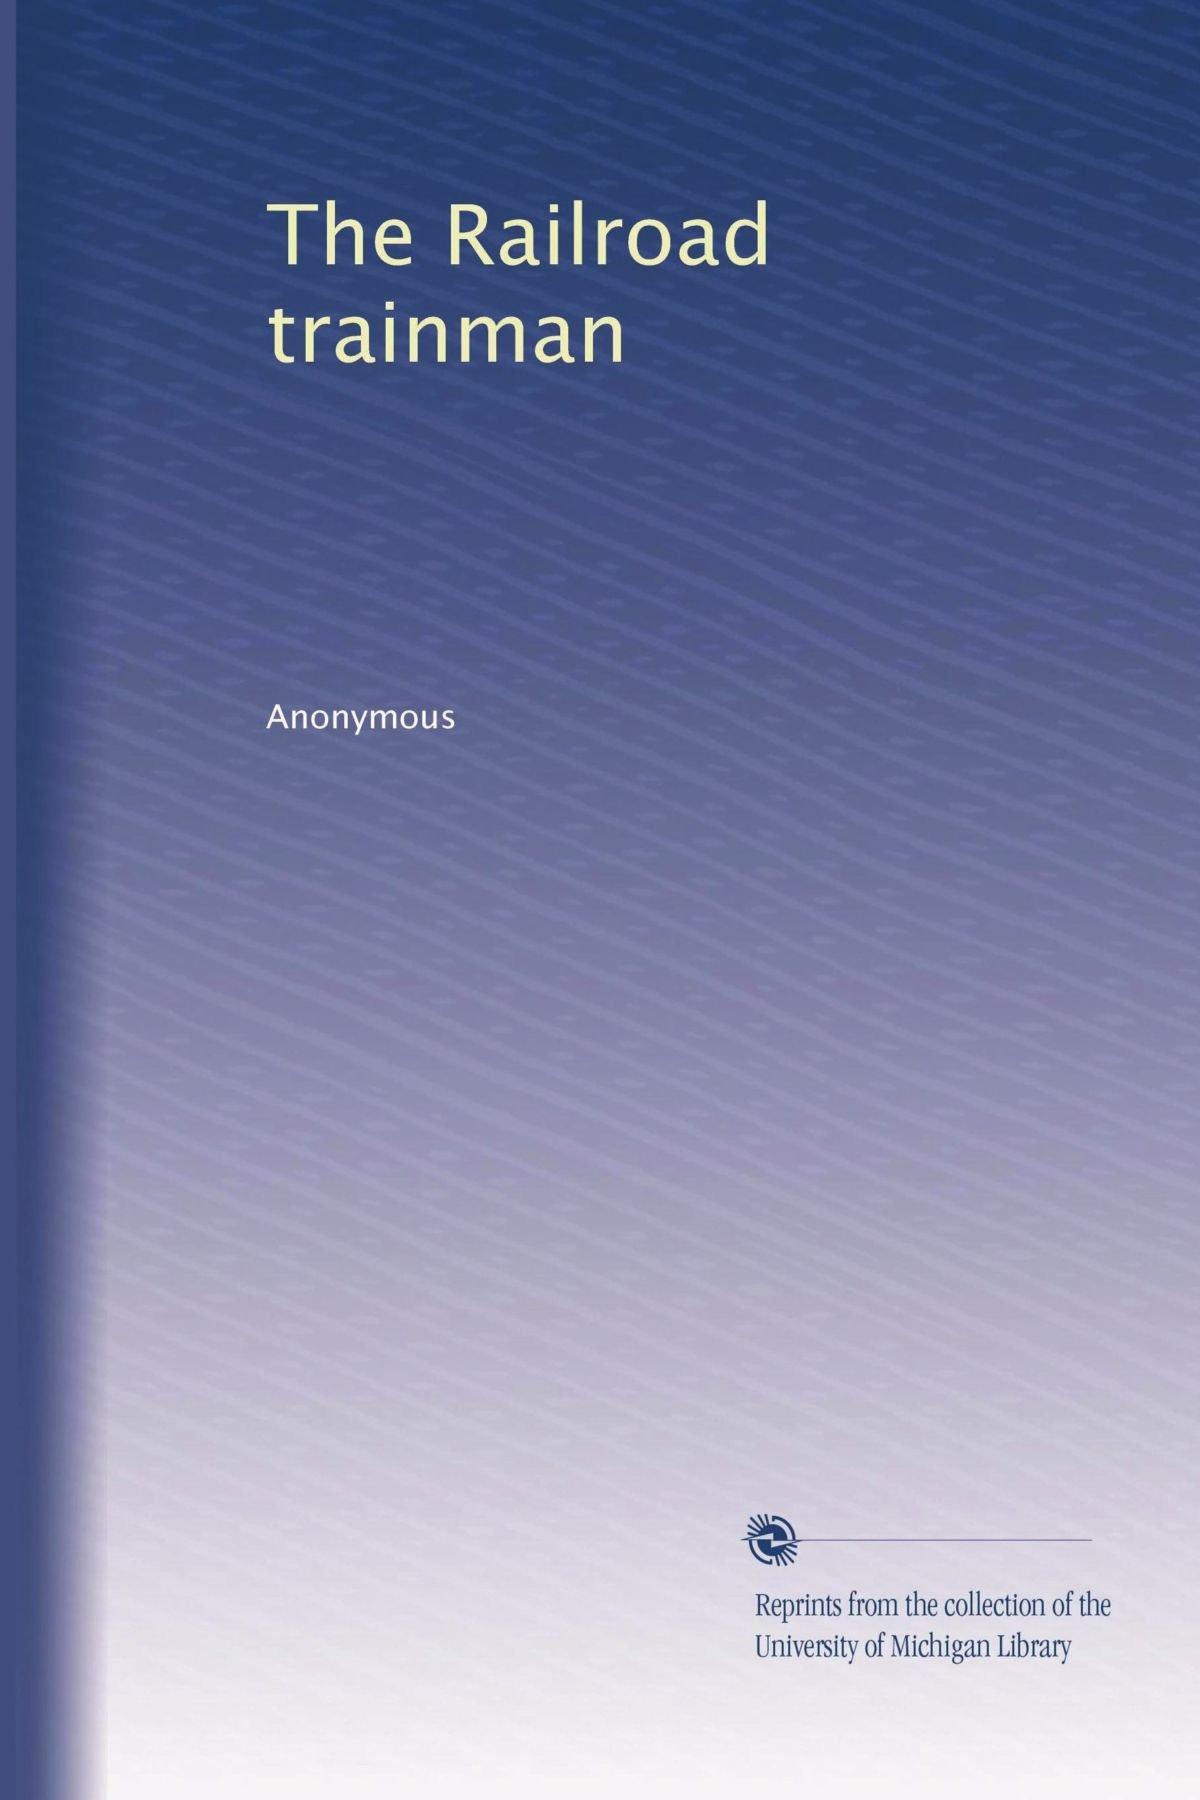 Download The Railroad trainman (Volume 27) ebook